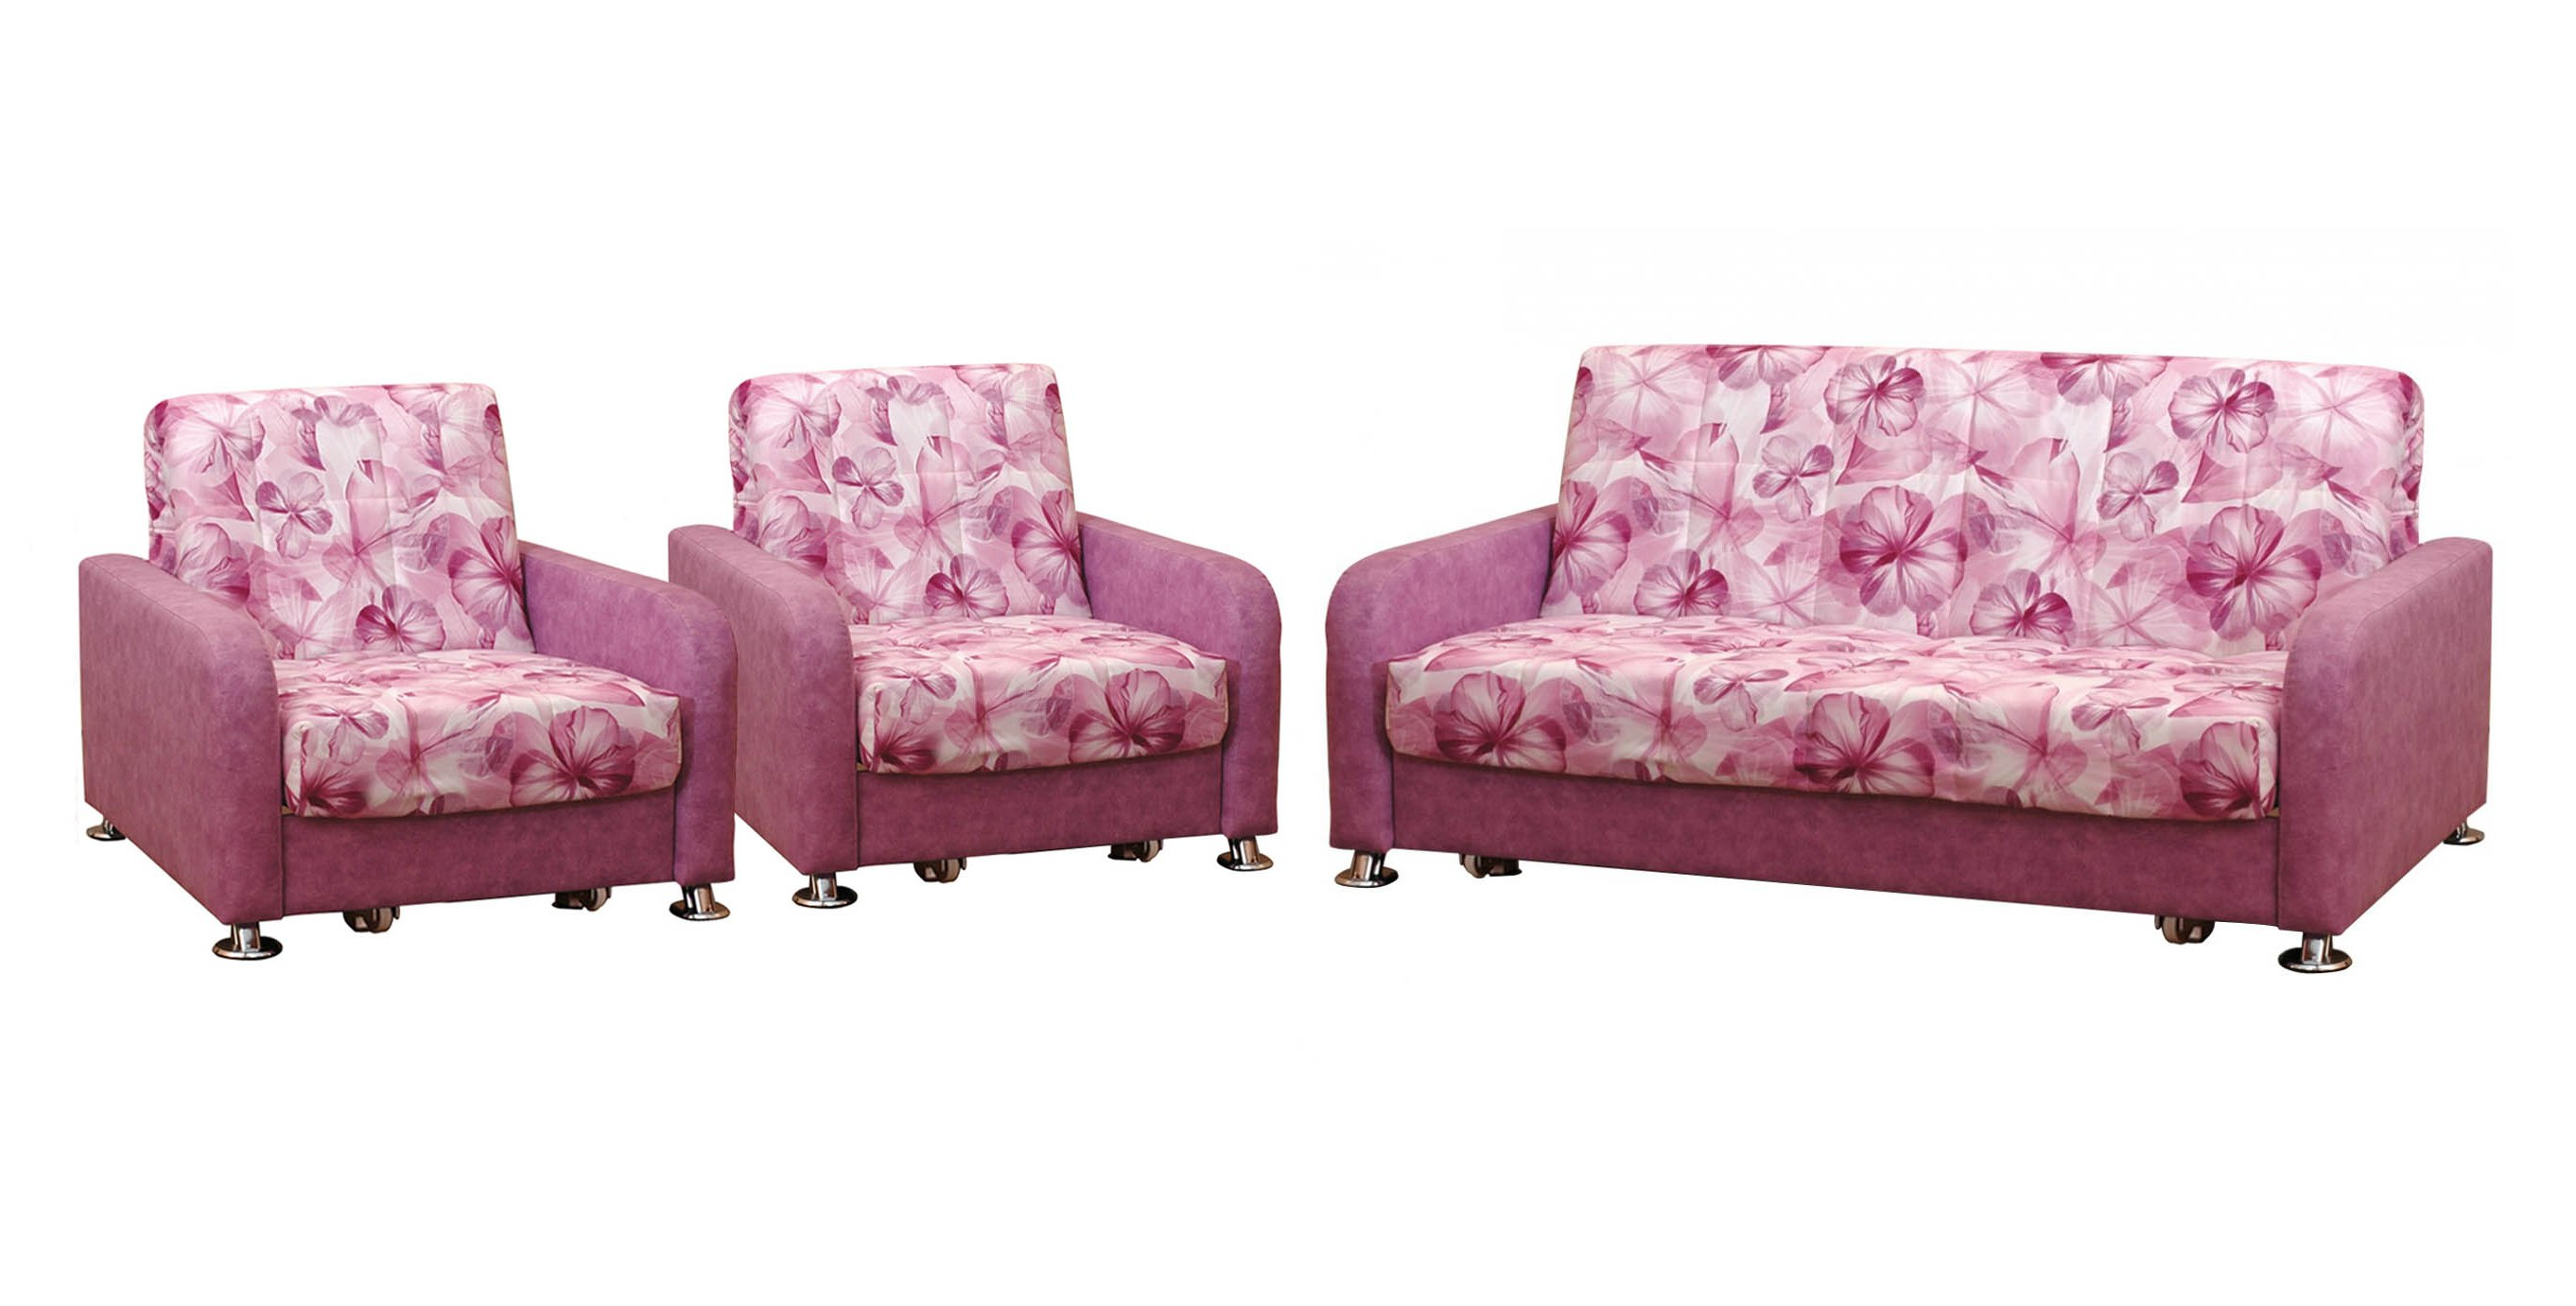 Комплект мягкой мебели Аккорд хром фото